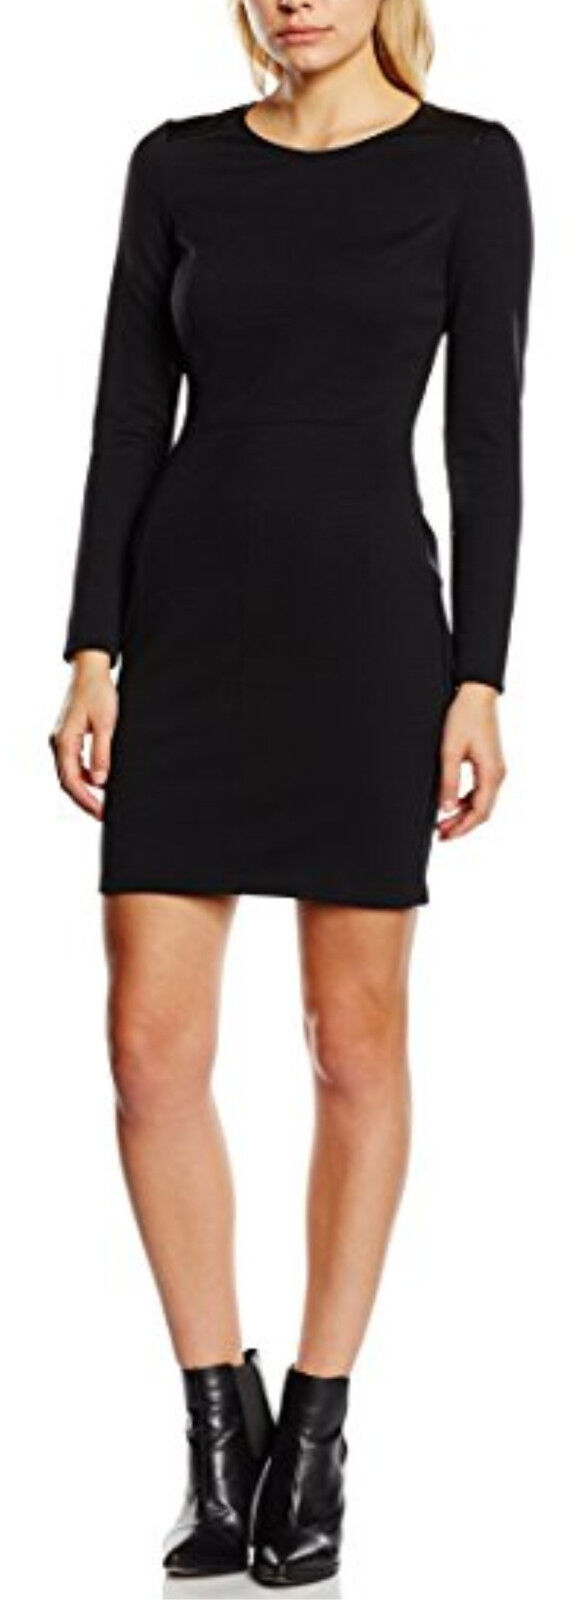 Boss Orange Aloka schwarz dress Größe 16UK